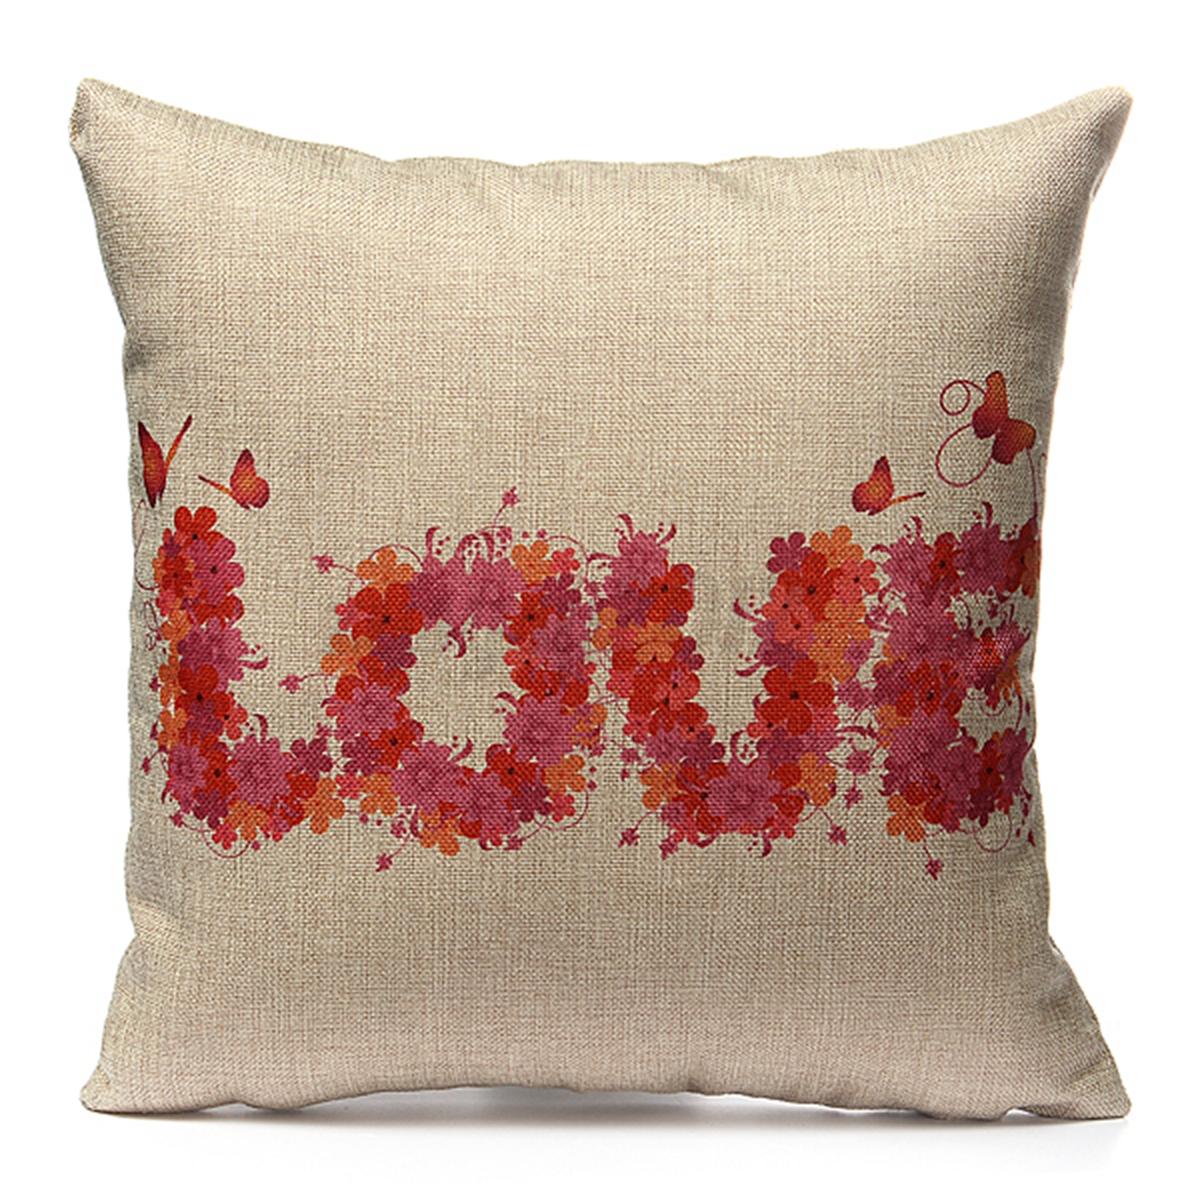 lover couple series cushion cover cotton linen pillow case c